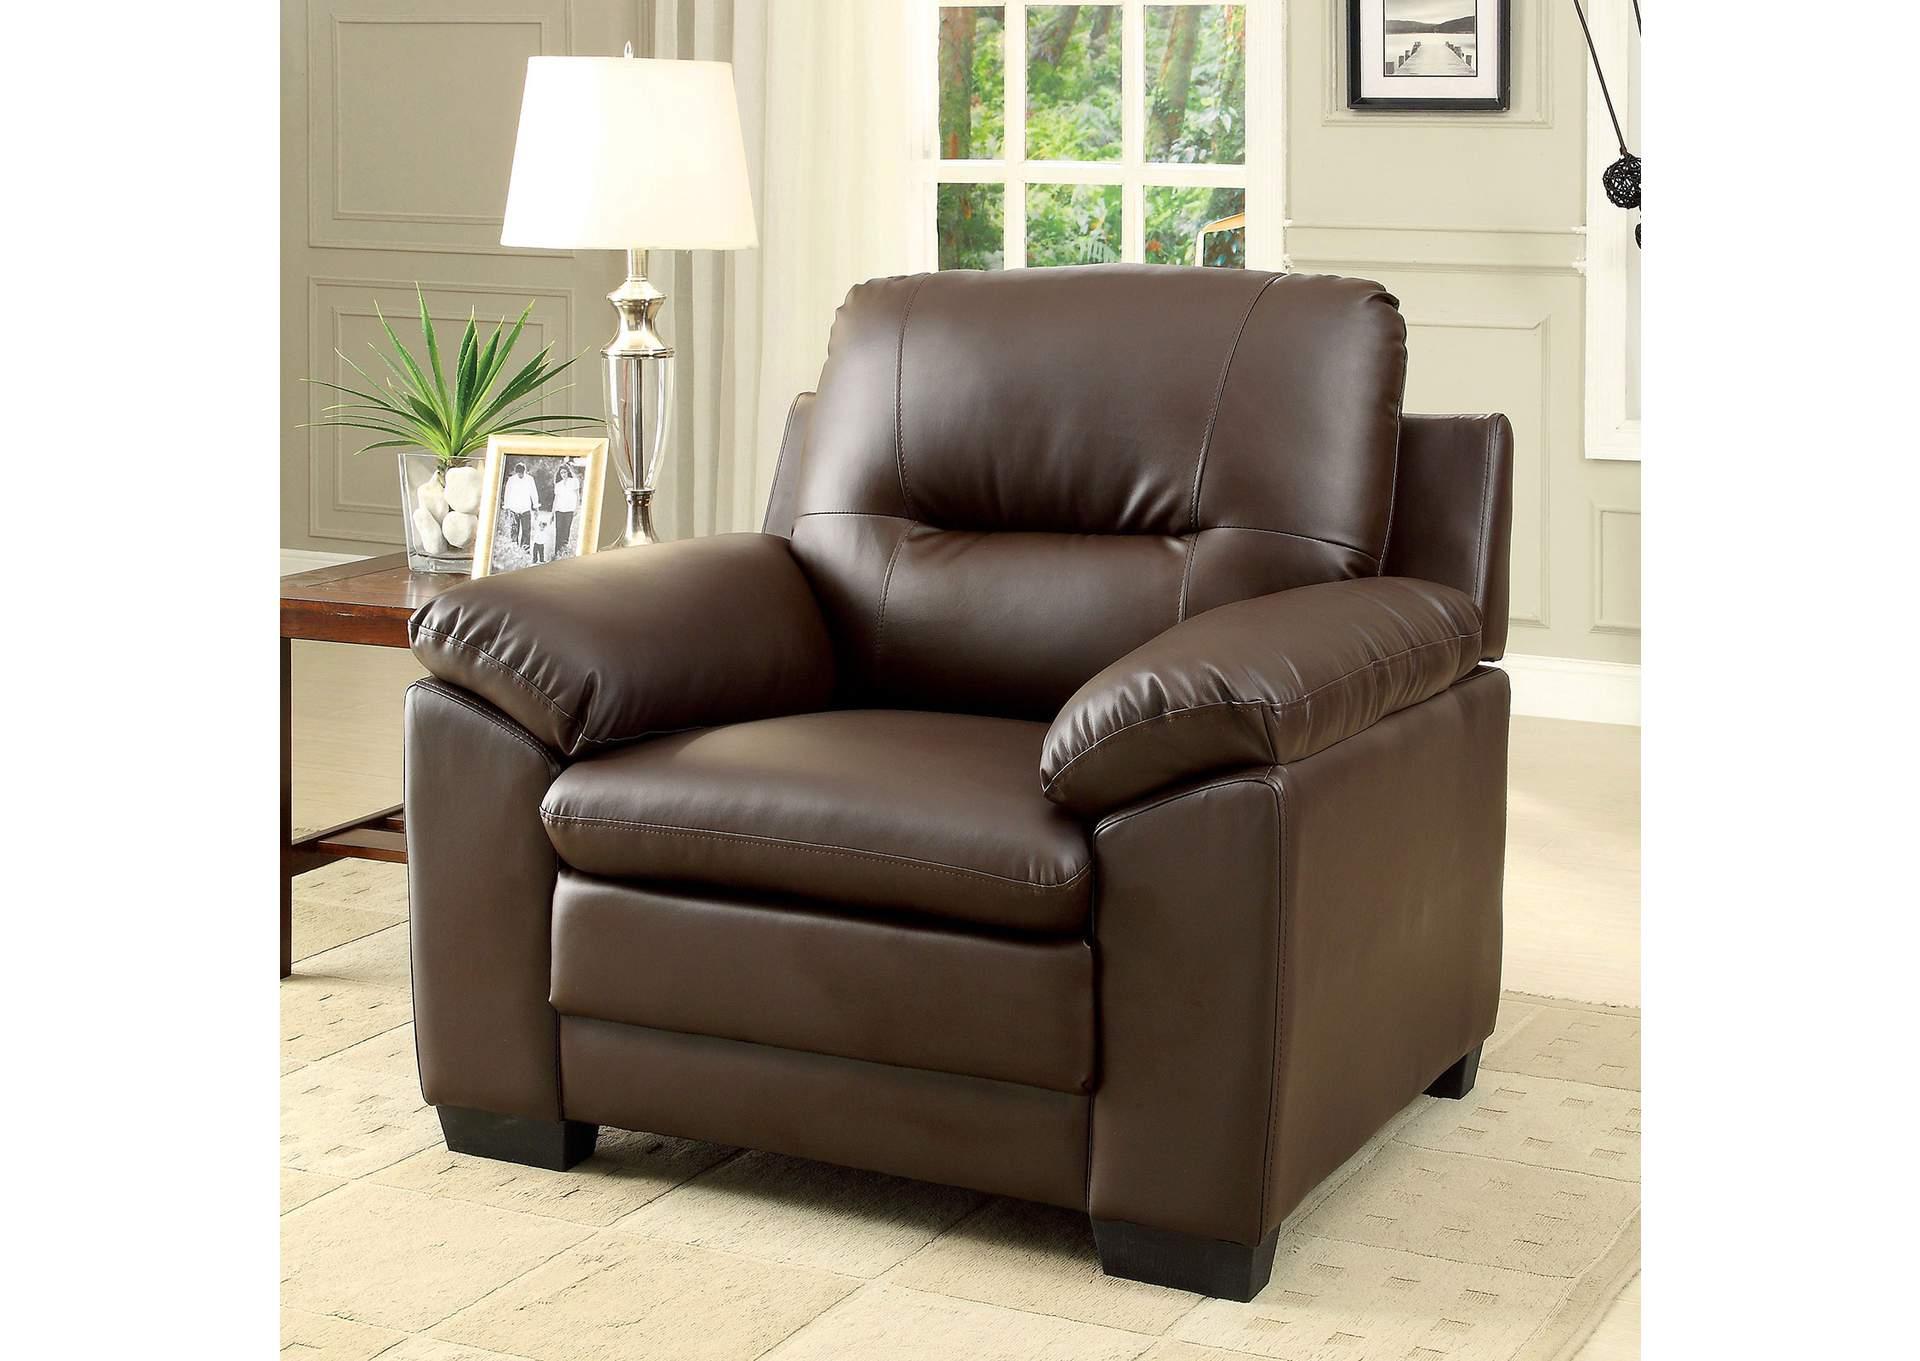 Parma Brown Polyurethane Single Chair,Furniture Of America